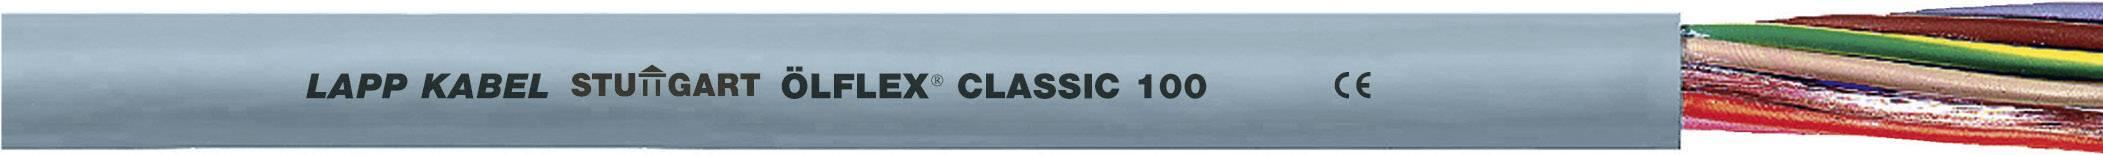 Kabel LappKabel Ölflex CLASSIC 100 18G1,5 (0010074), PVC, 14,4 mm, 500 V, šedá, 500 m